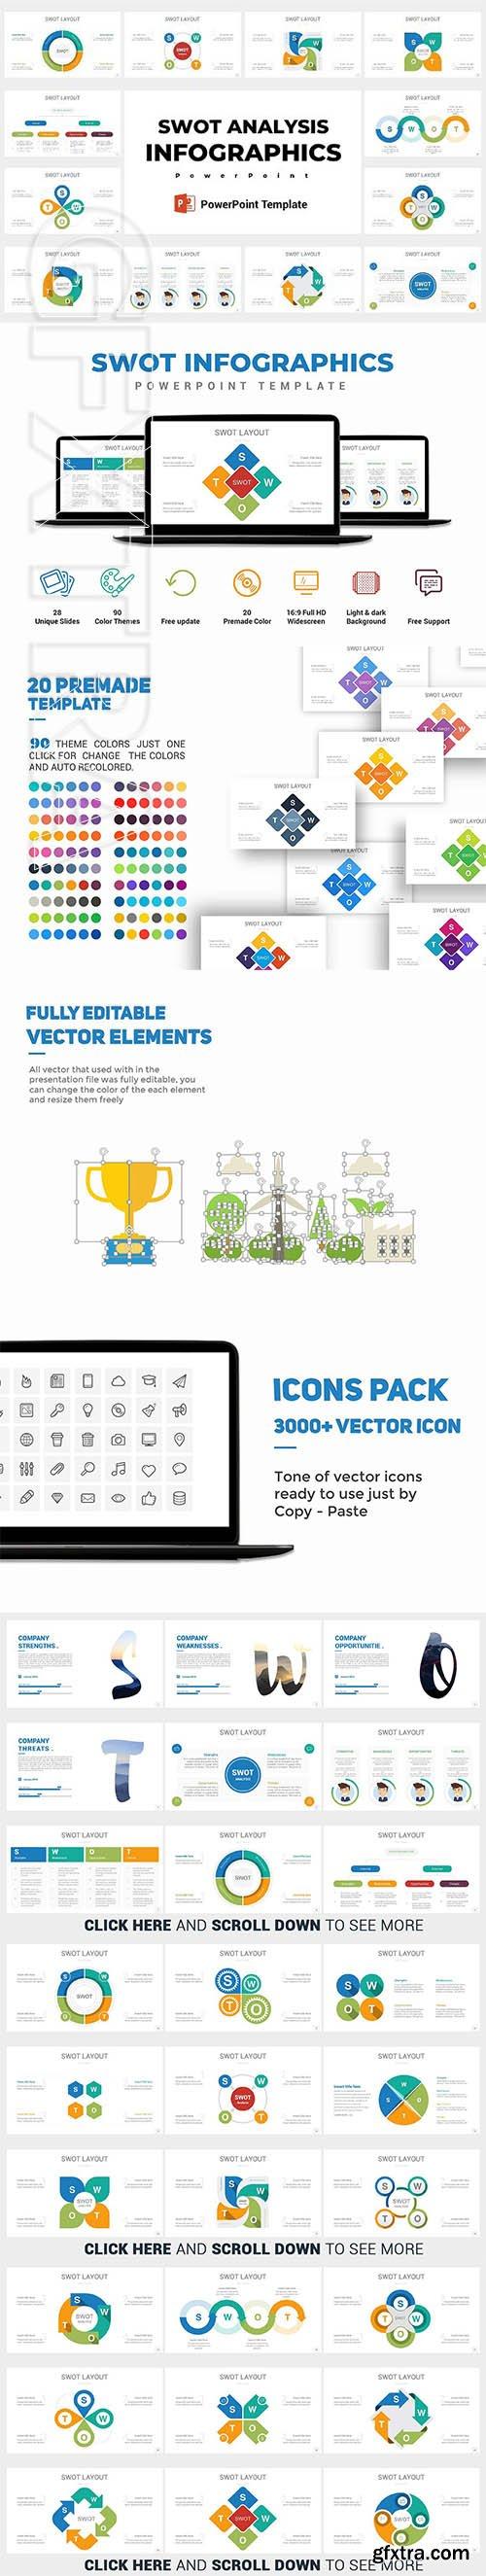 CreativeMarket - Swot Analysis Infographics 2442276